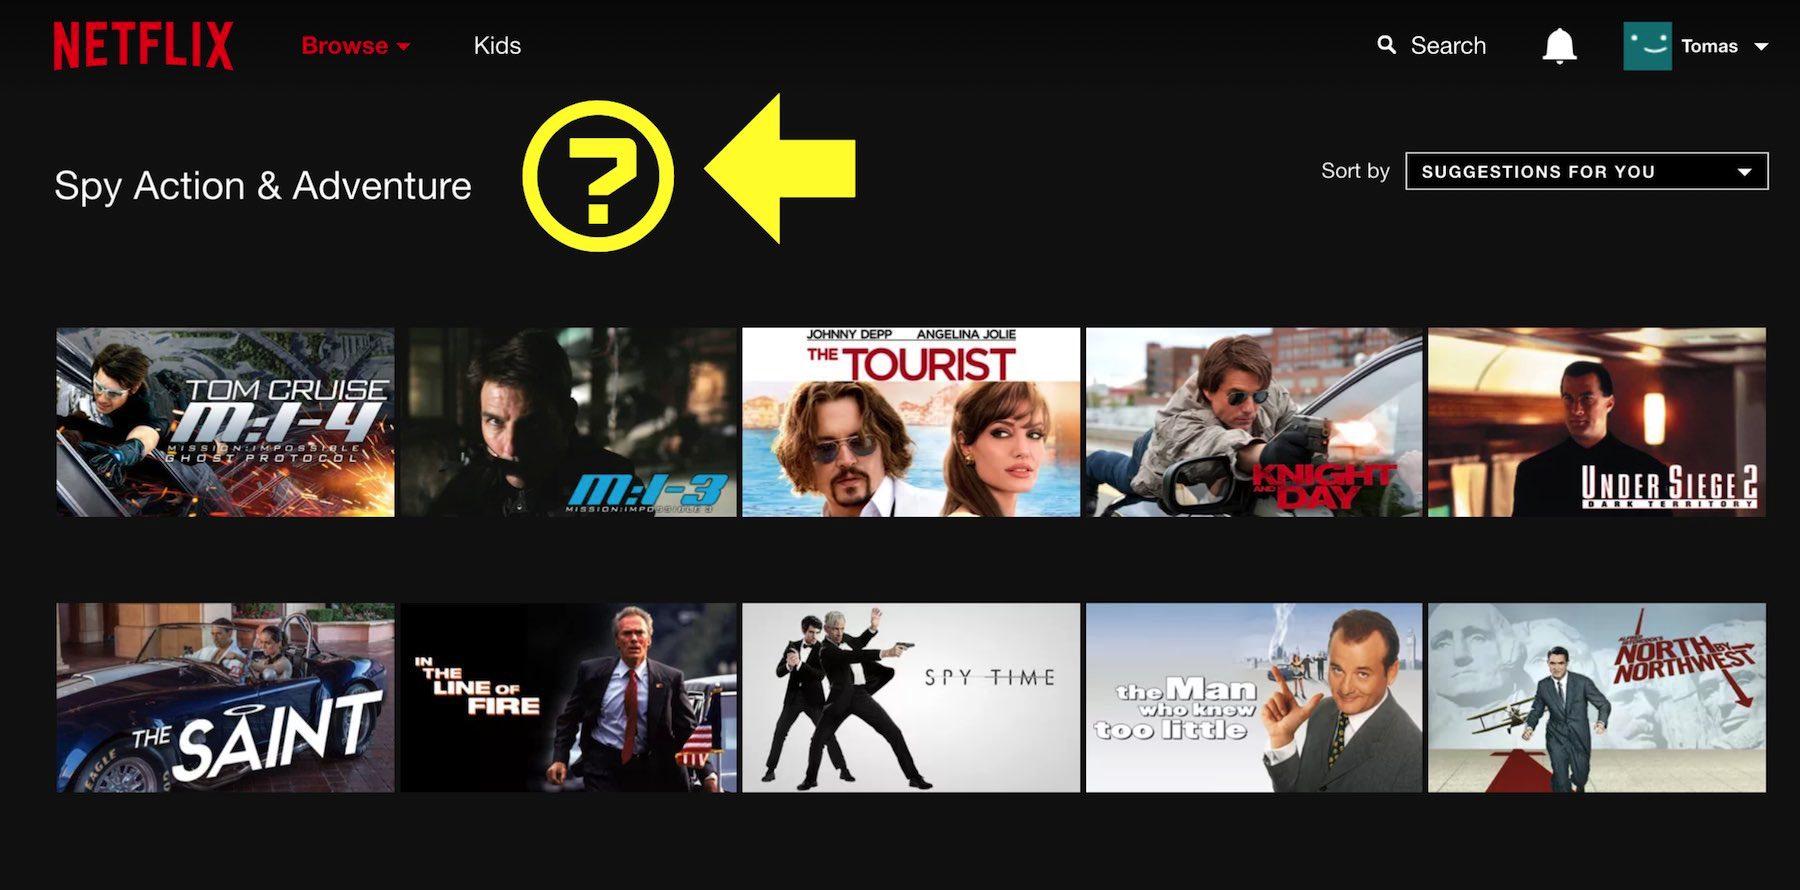 10 tipů a triků, jak si užít Netflix naplno